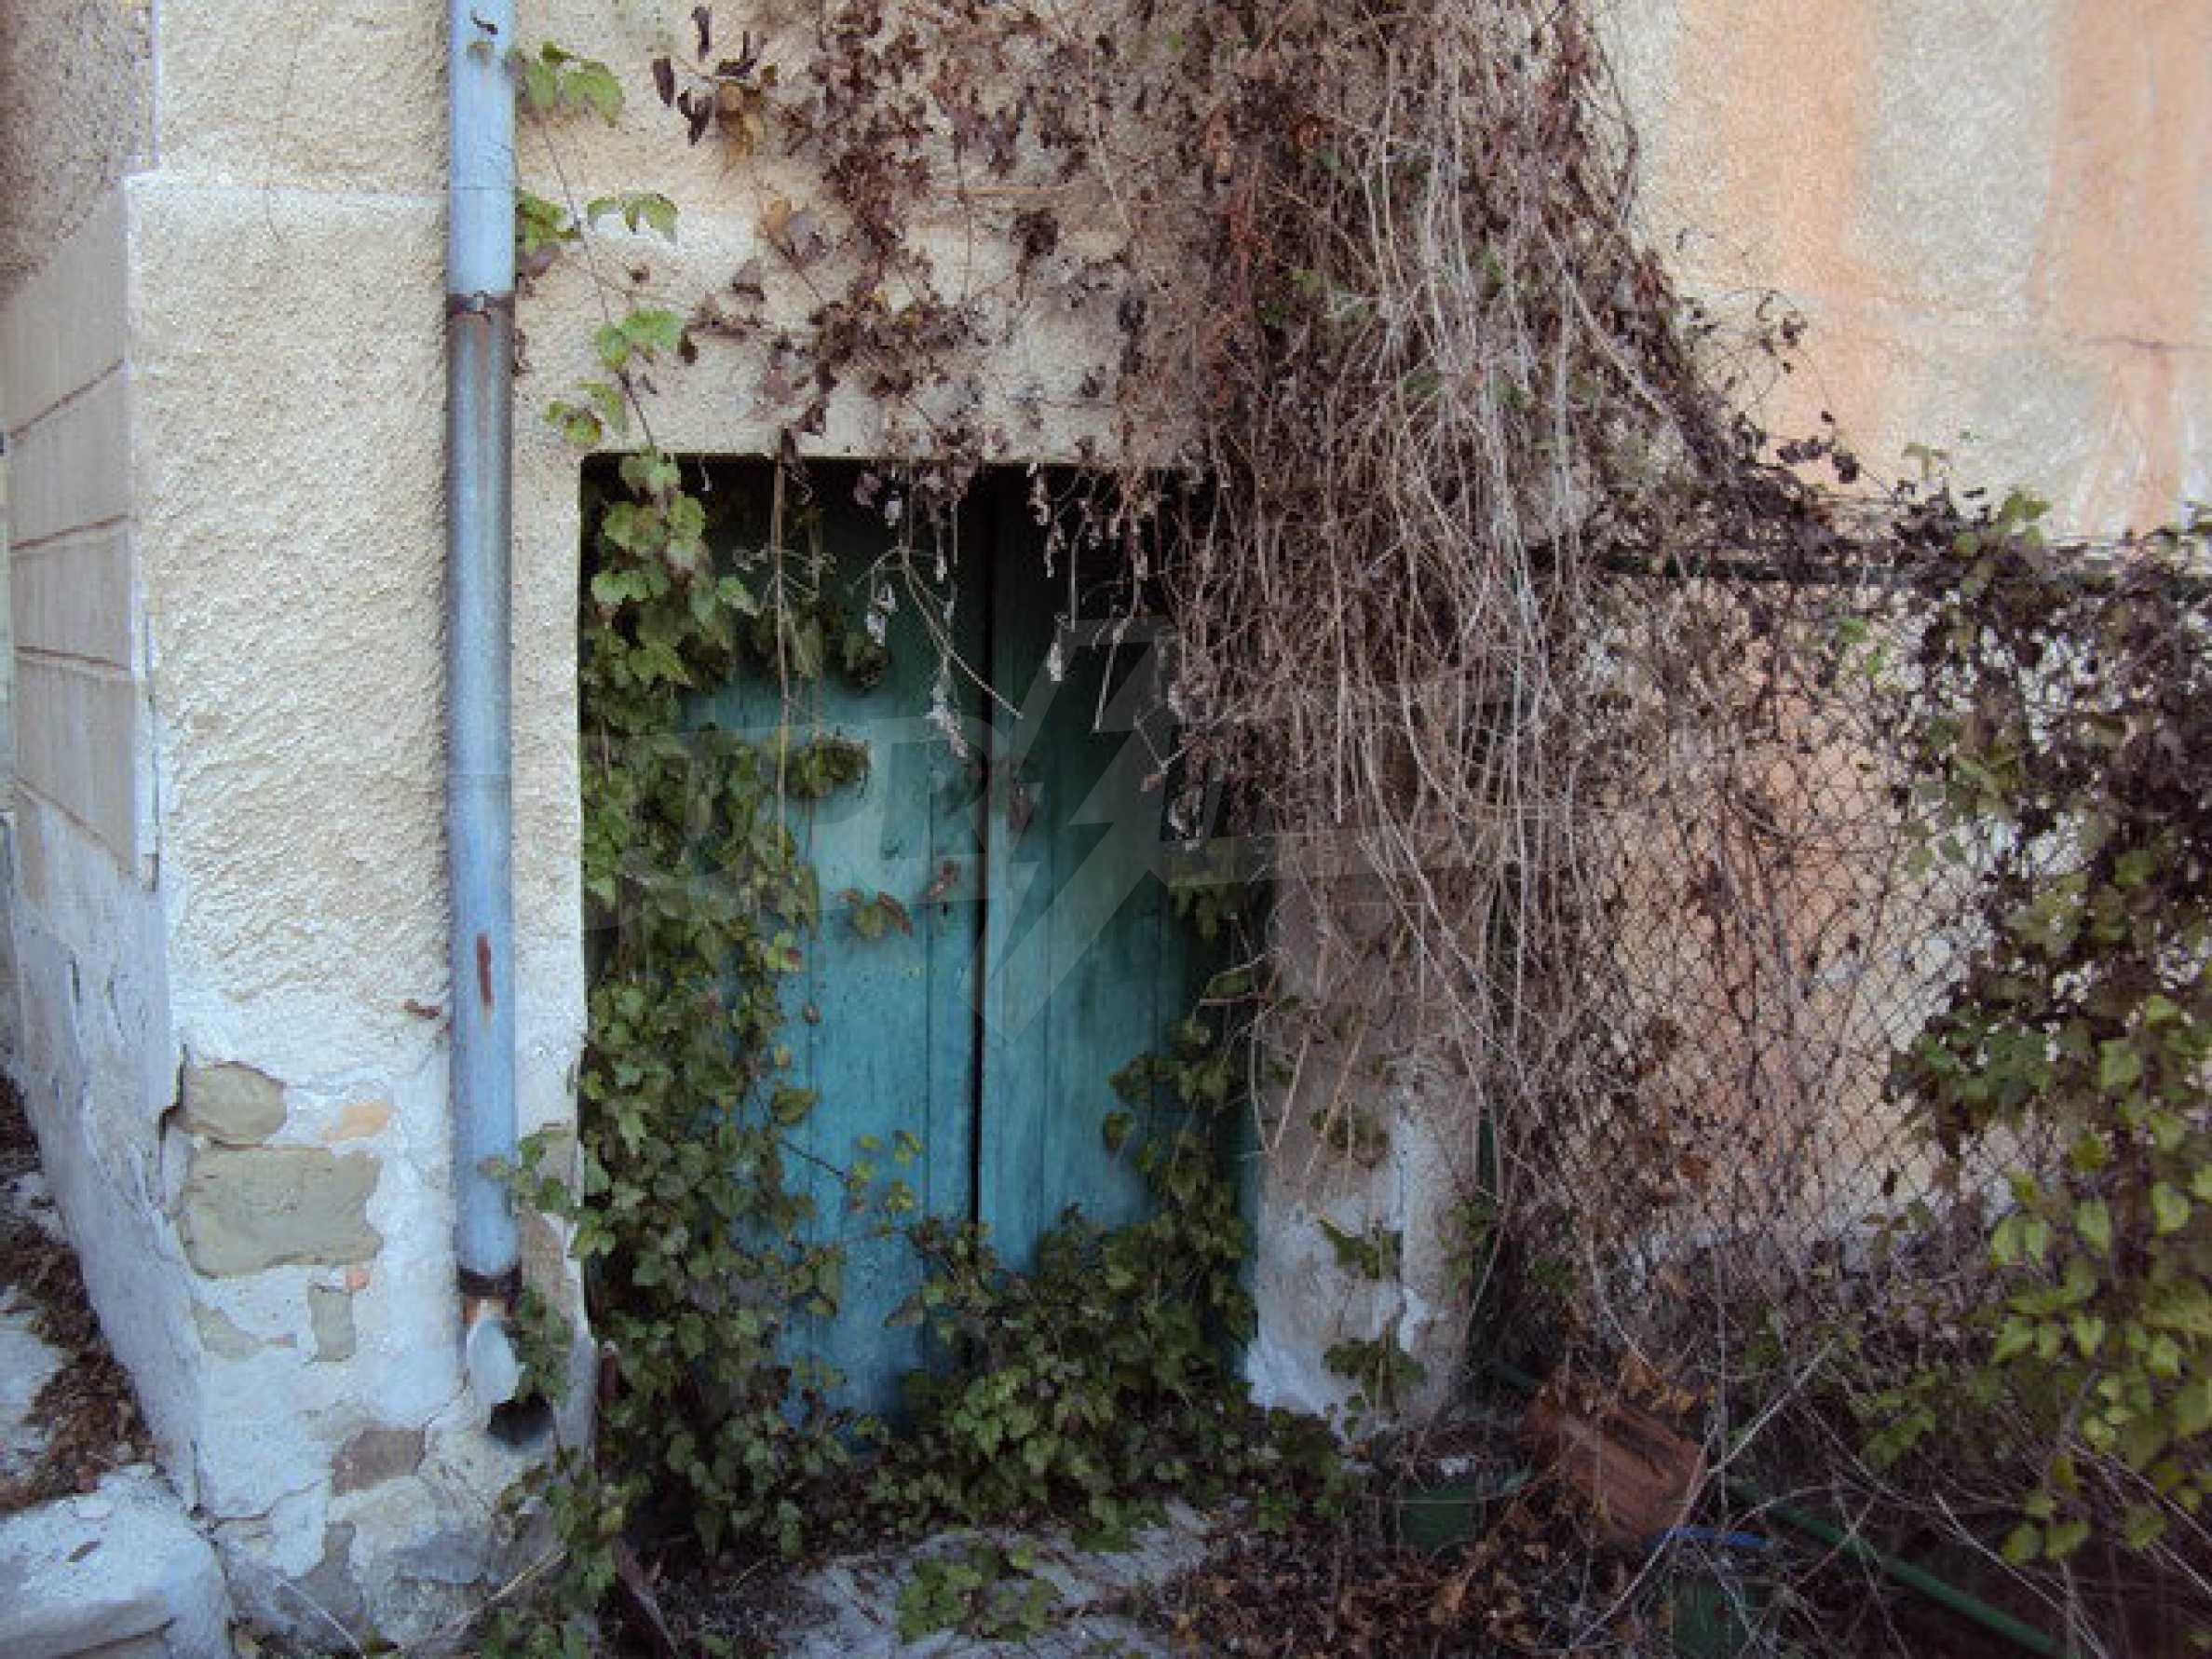 House with garden 25 km away from Veliko Tarnovo 21